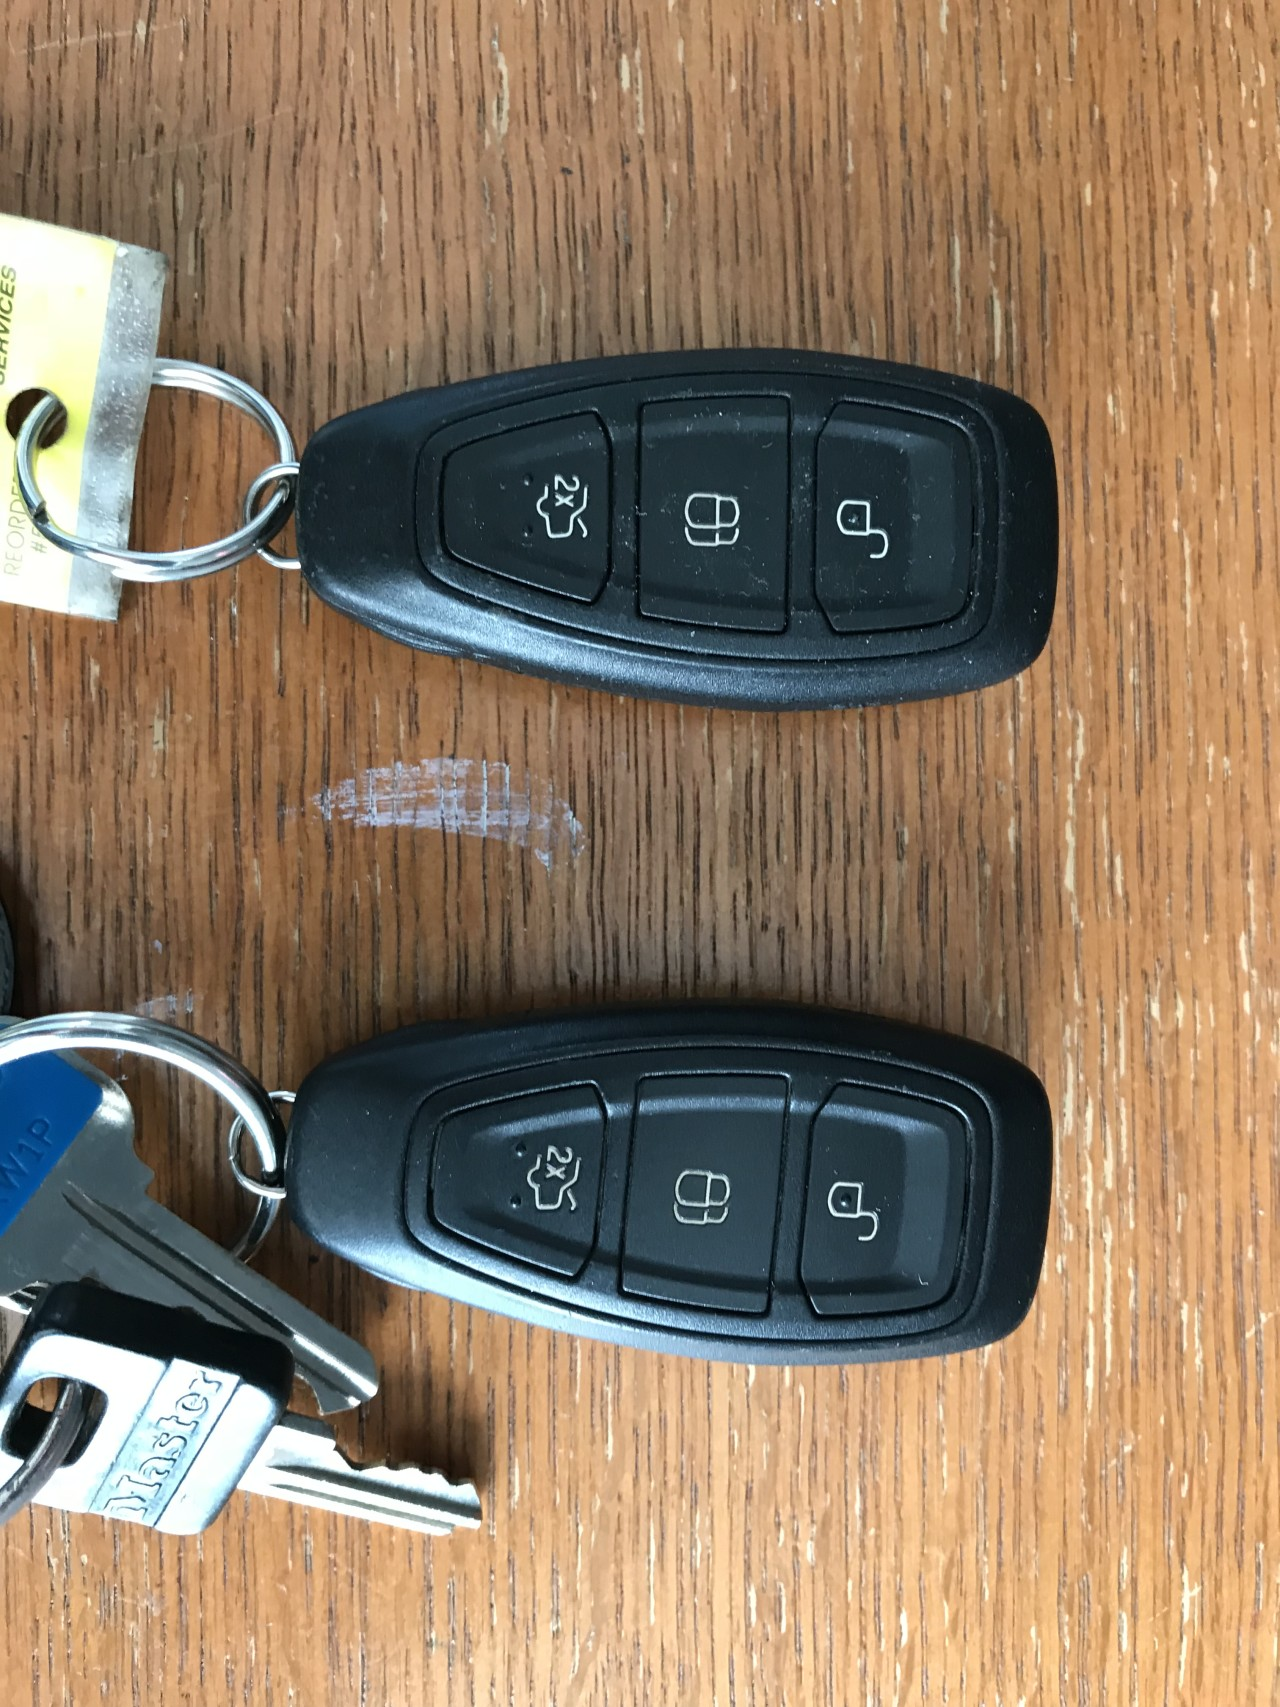 Key Fob battery change | ford | focus-gen3 | diys | DIY